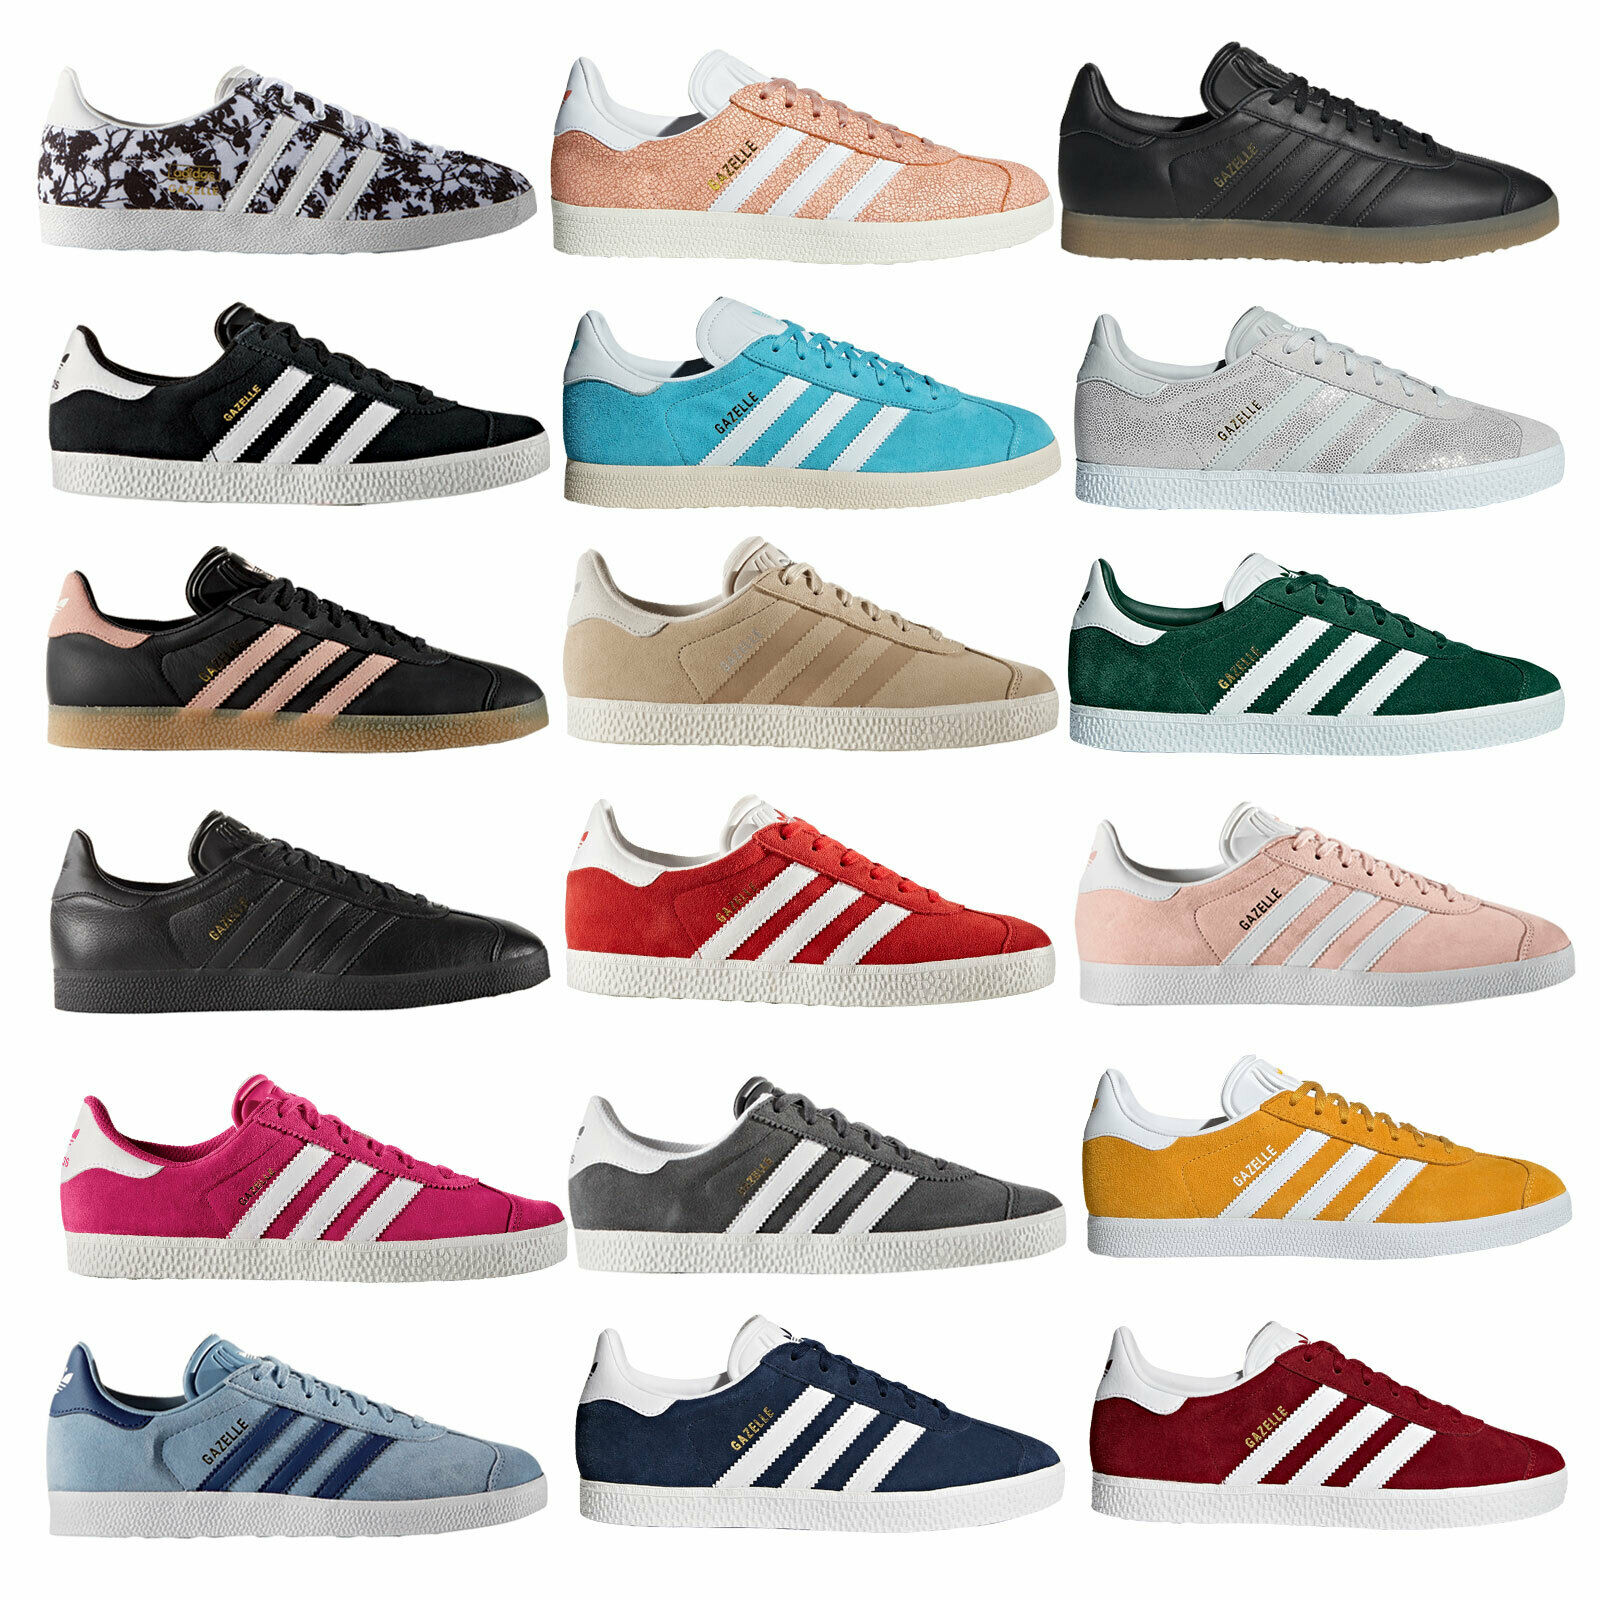 adidas Originals Gazelle Baskets Chaussures de sport femmes & enfants